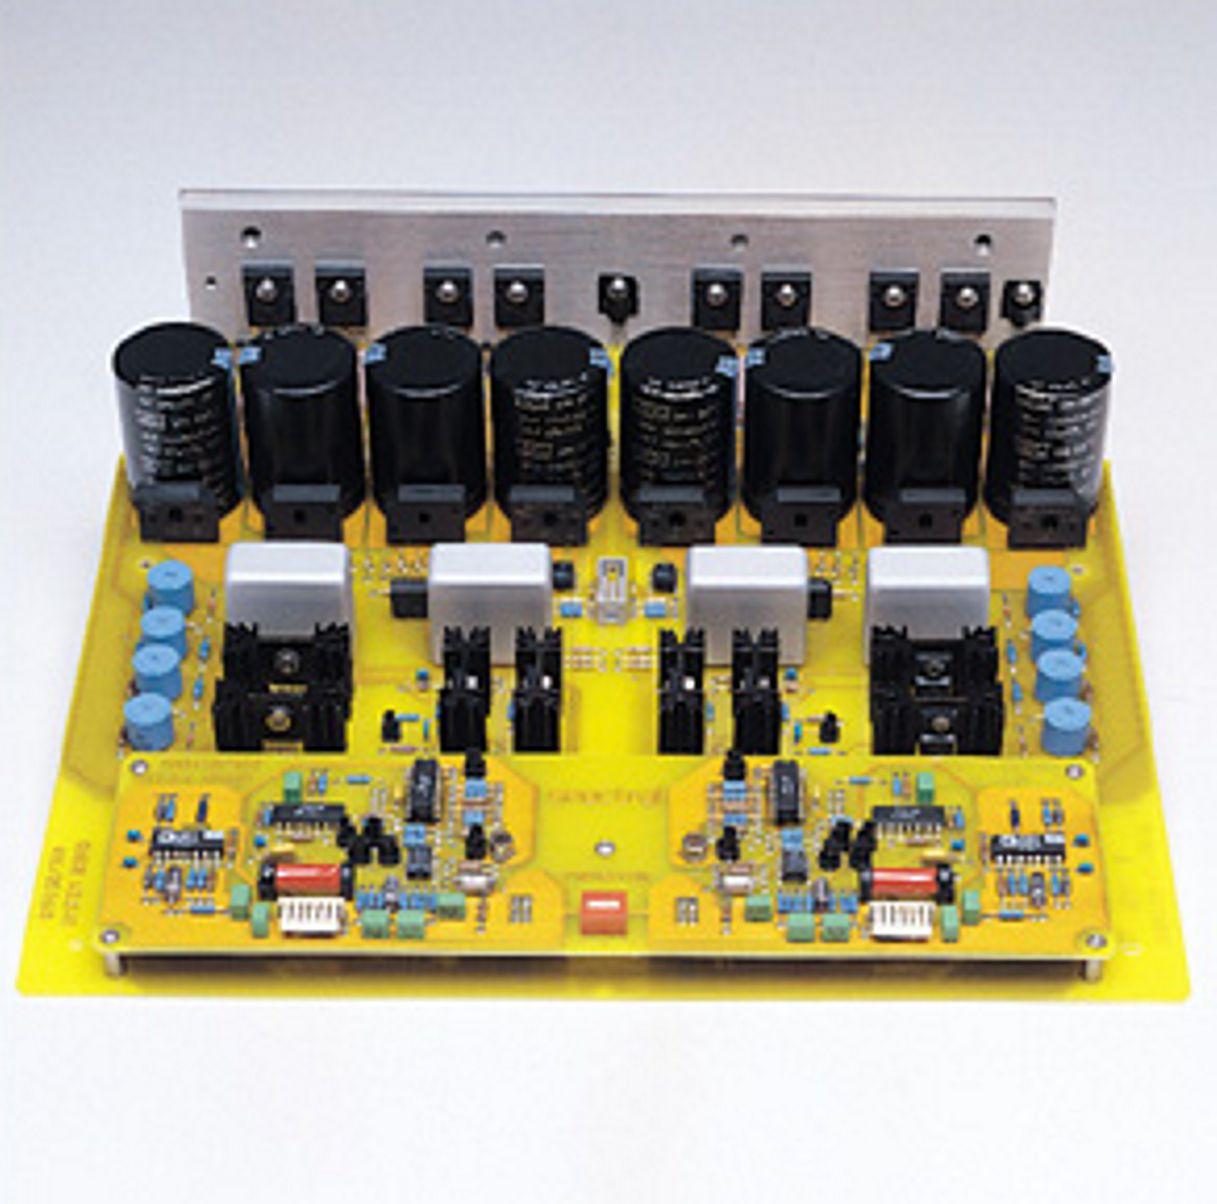 Spectral Audio Dma 200s High Resolution Amplifier Power